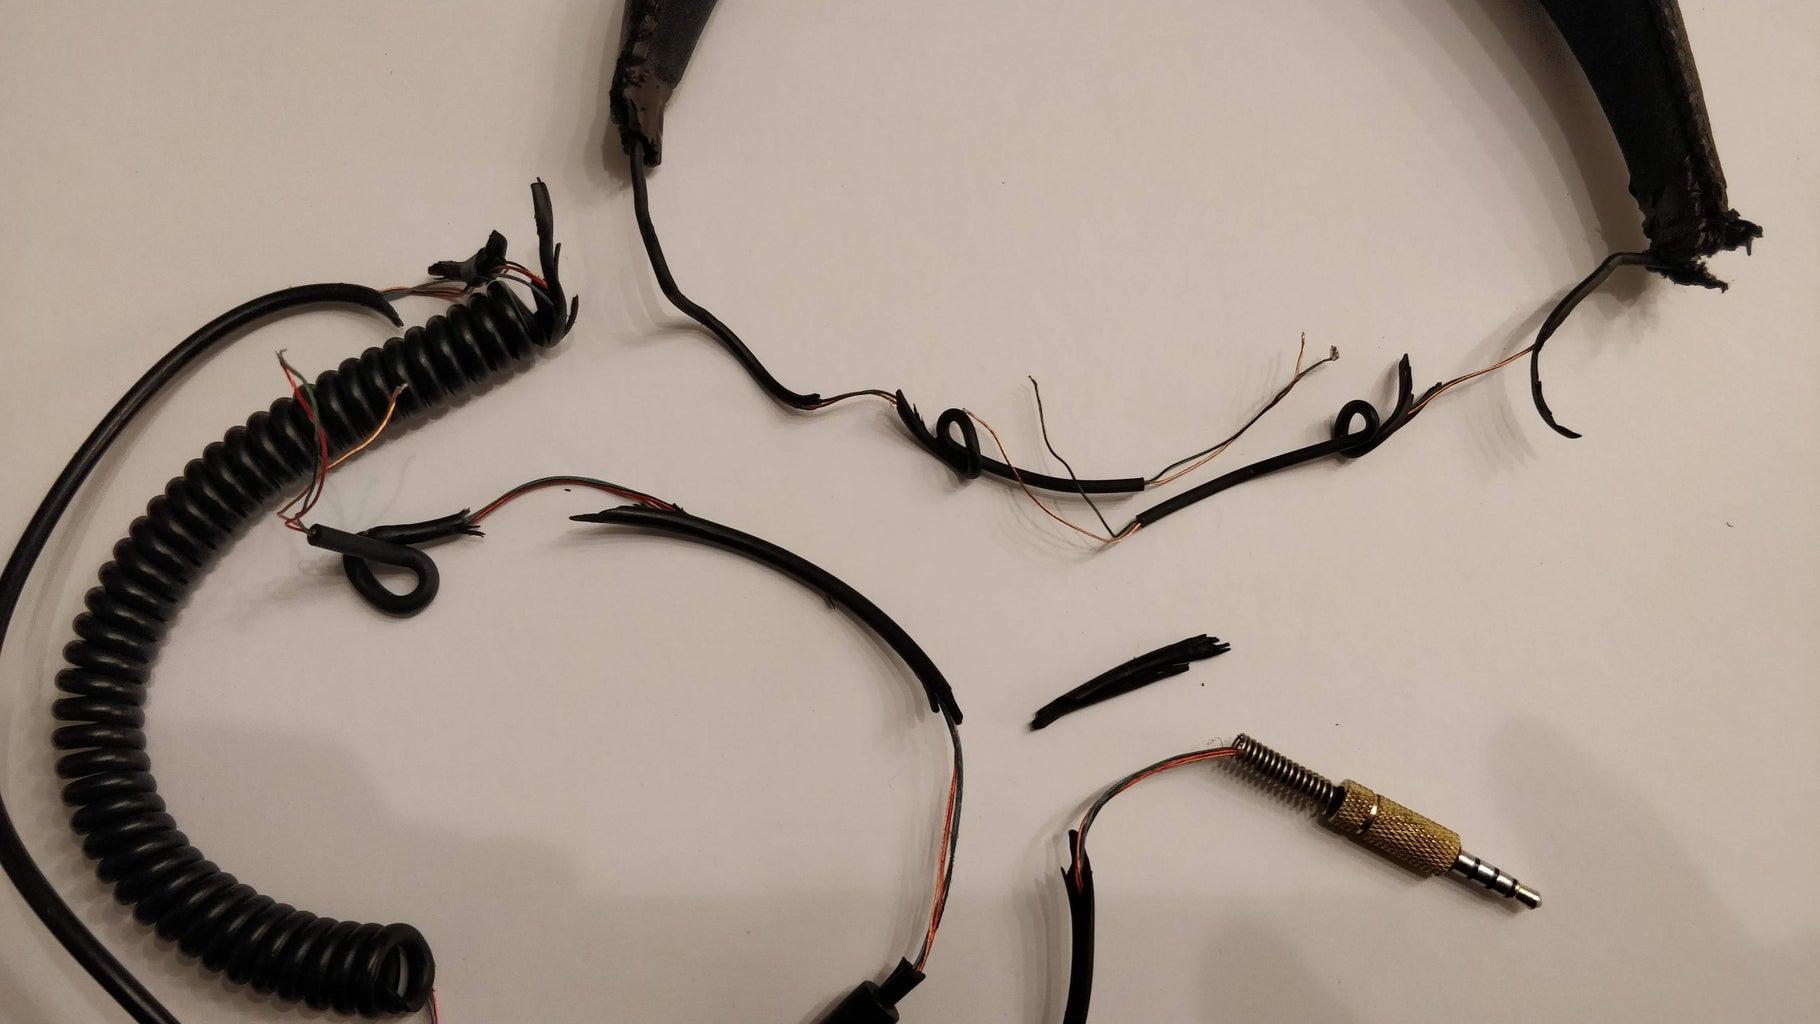 How to Repair Marshall Major I Headphone